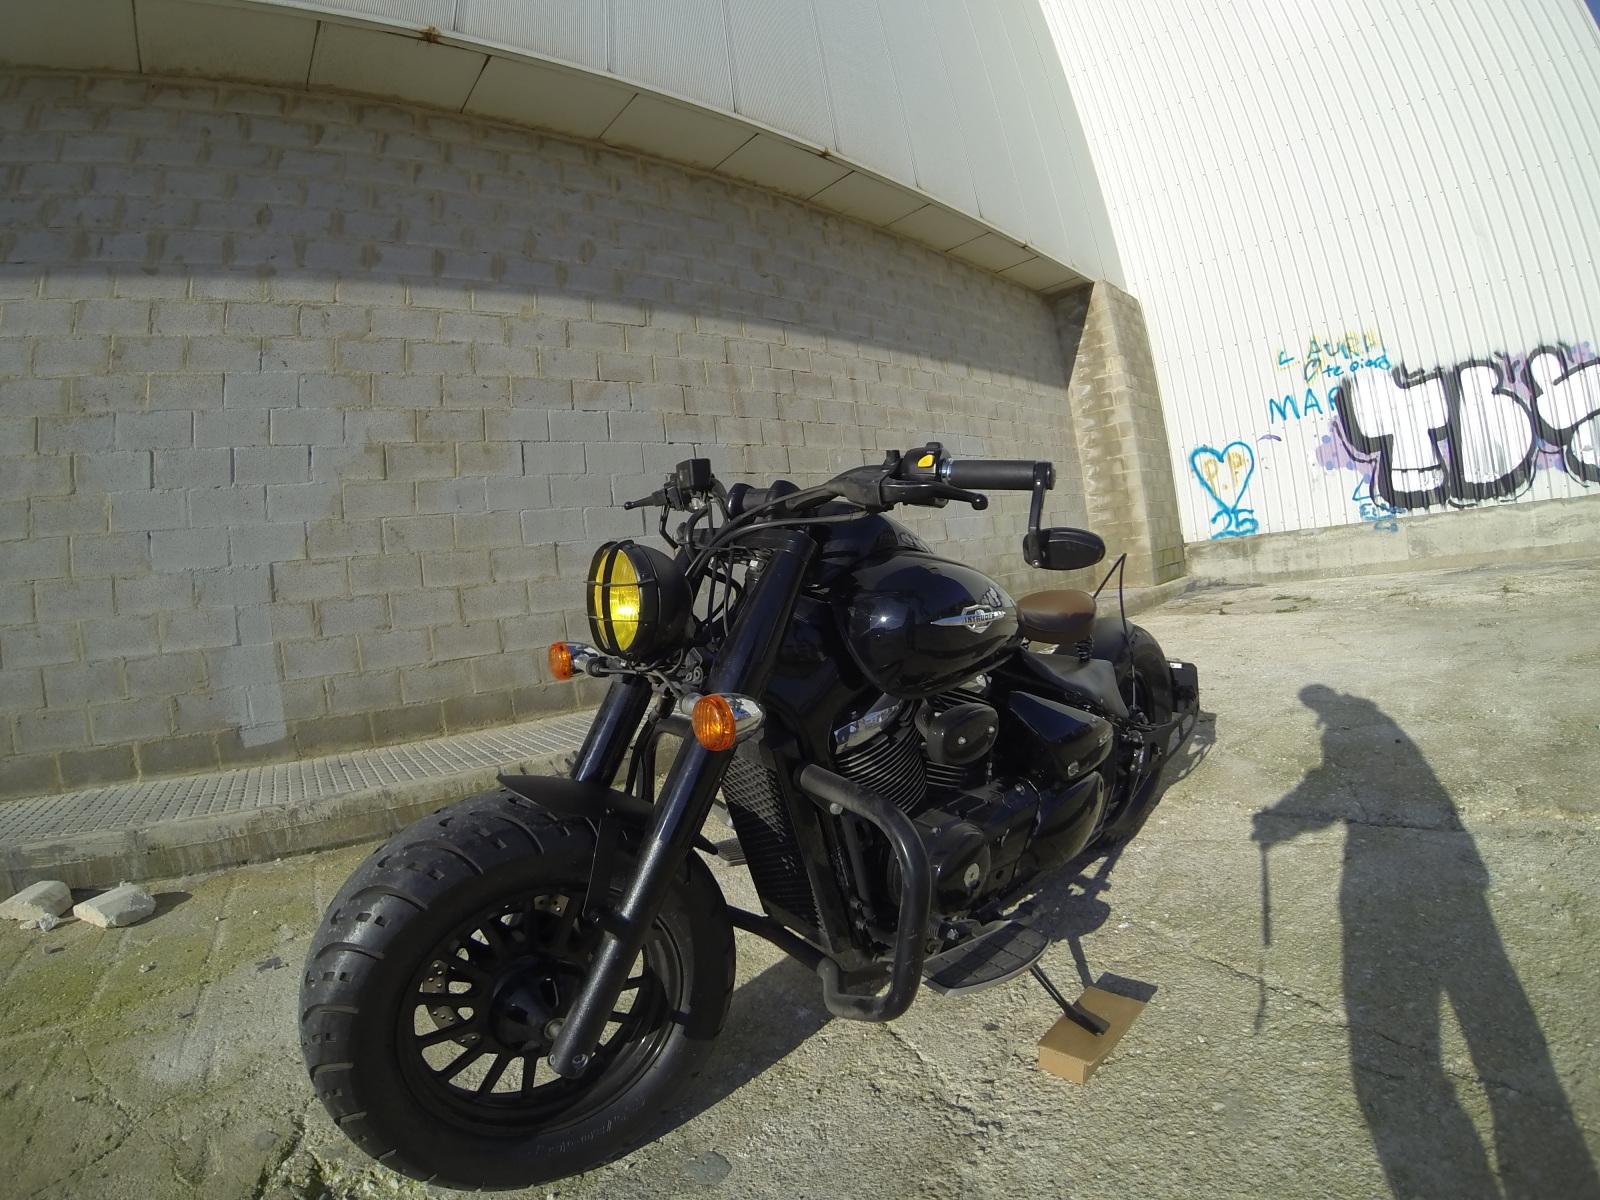 My Intruder c800 black edition bobber project Ay9dz6